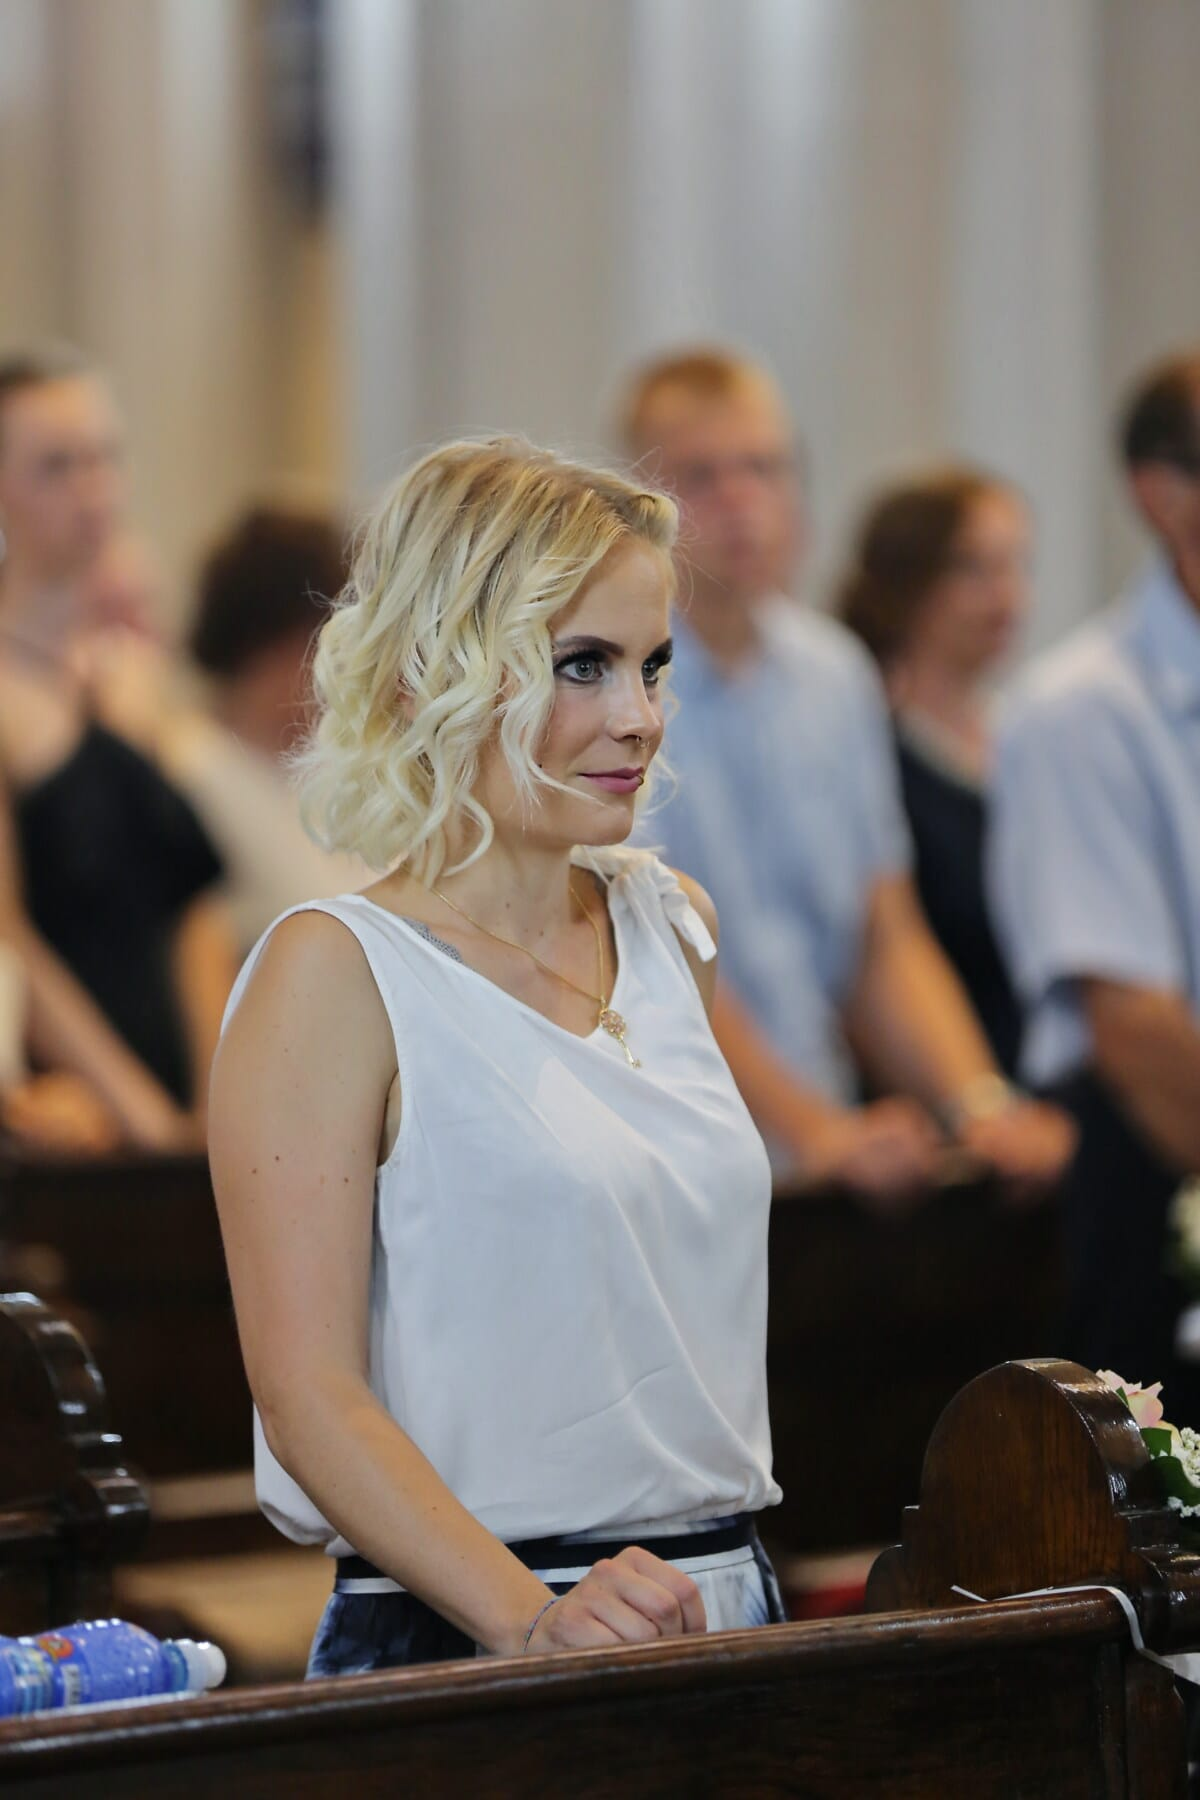 church, standing, pretty, christian, spirituality, blonde hair, prayer, christianity, woman, man